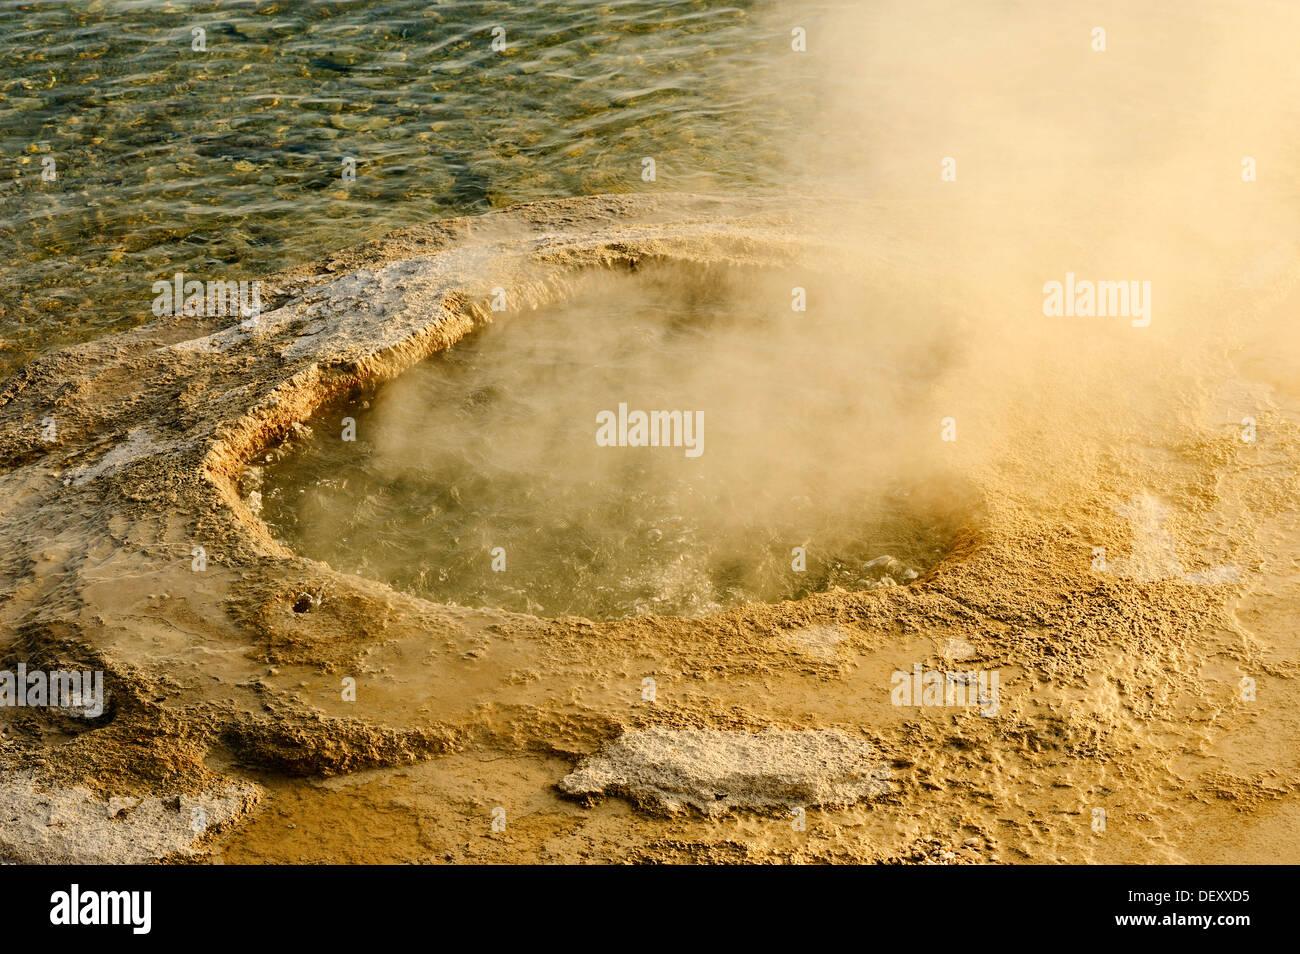 Lakeshore Geyser, West Thumb Geyser Basin, Yellowstone National Park, Wyoming, USA - Stock Image